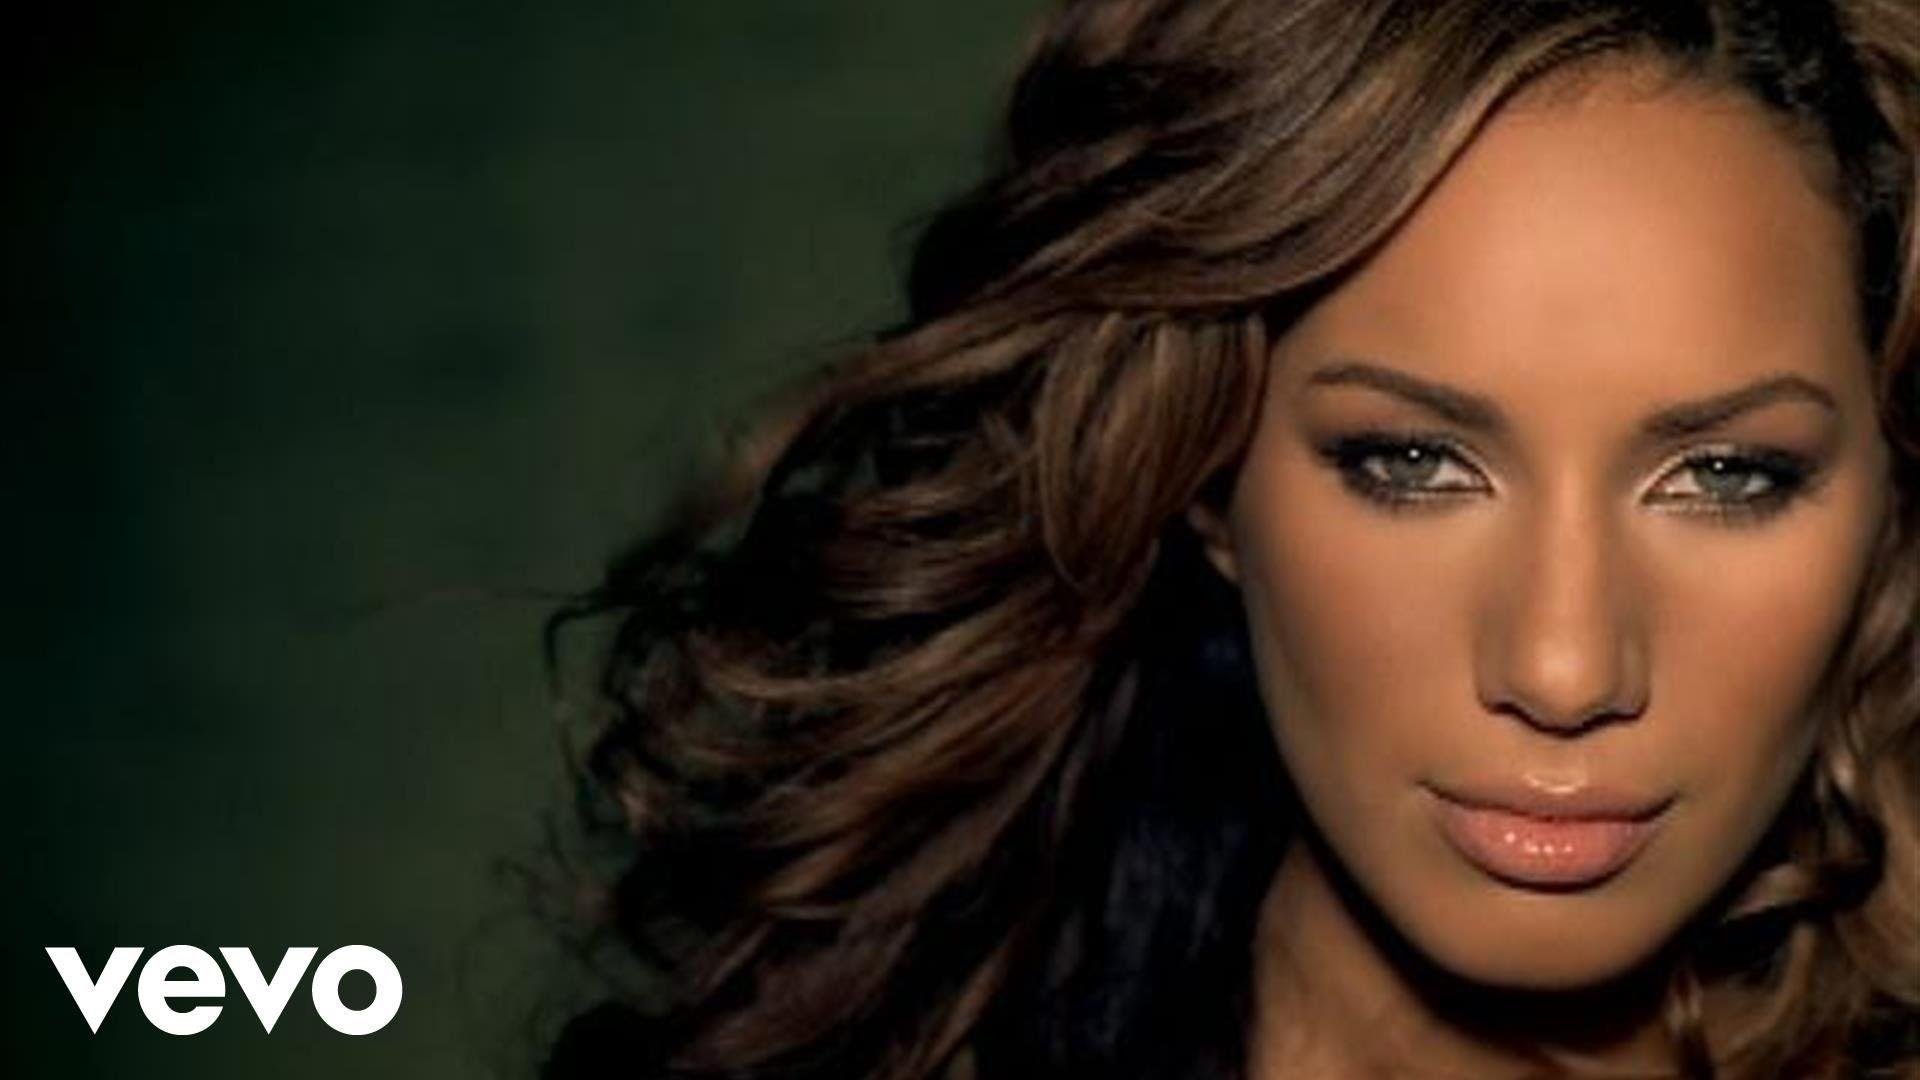 Leona Lewis - Bleeding Love (US Version) - YouTube | 洋楽